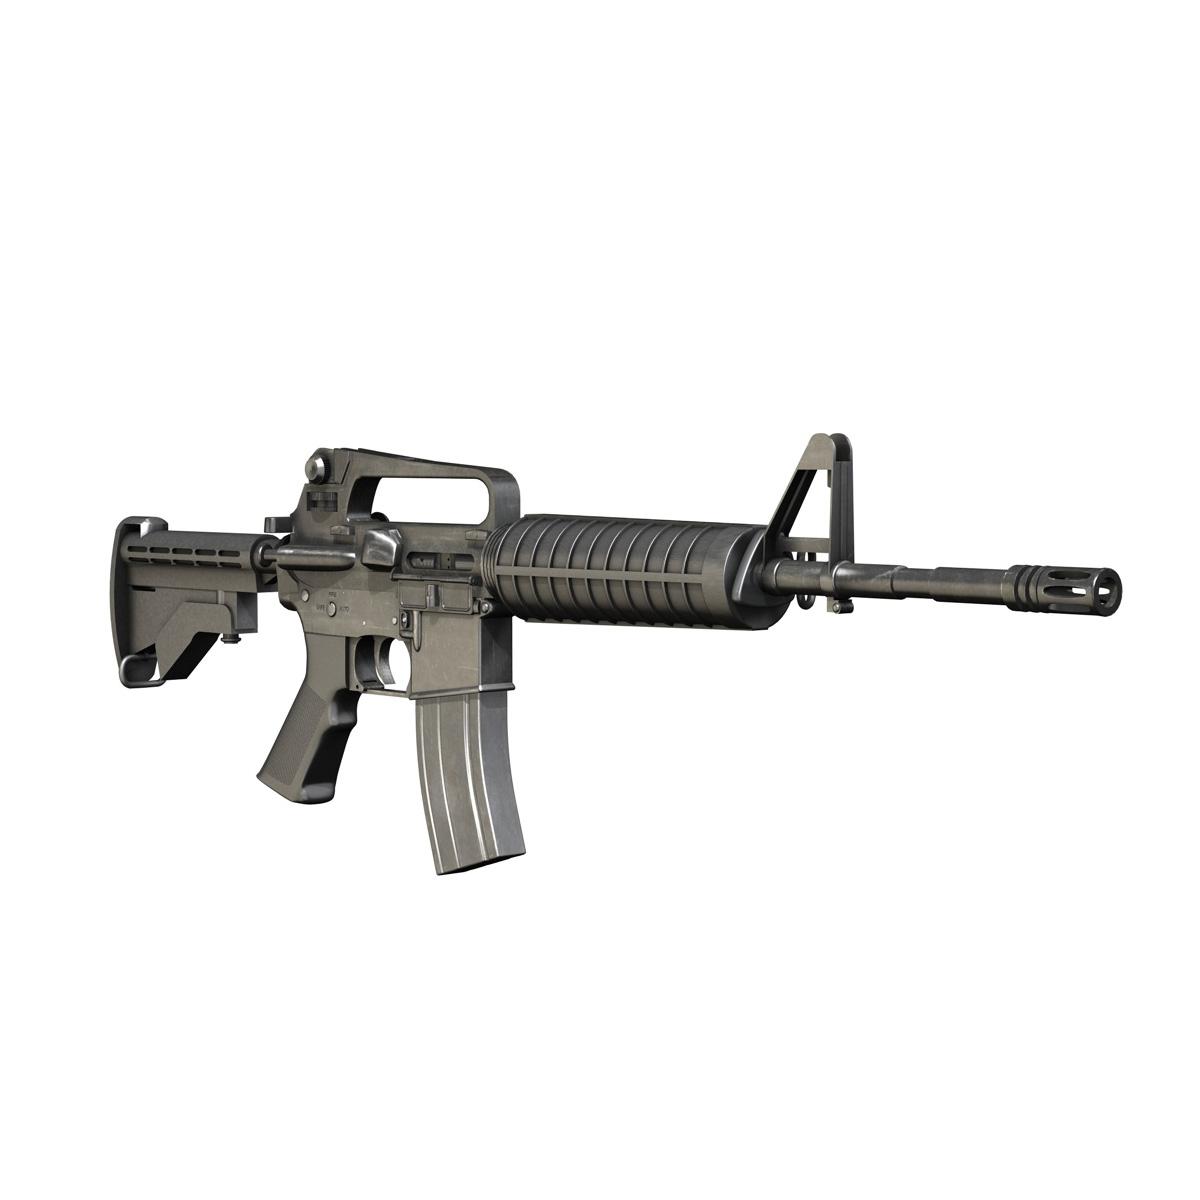 colt m4a1 carbine довтолгооны буу 3d загвар 3ds fbx c4d lwo obj 187791